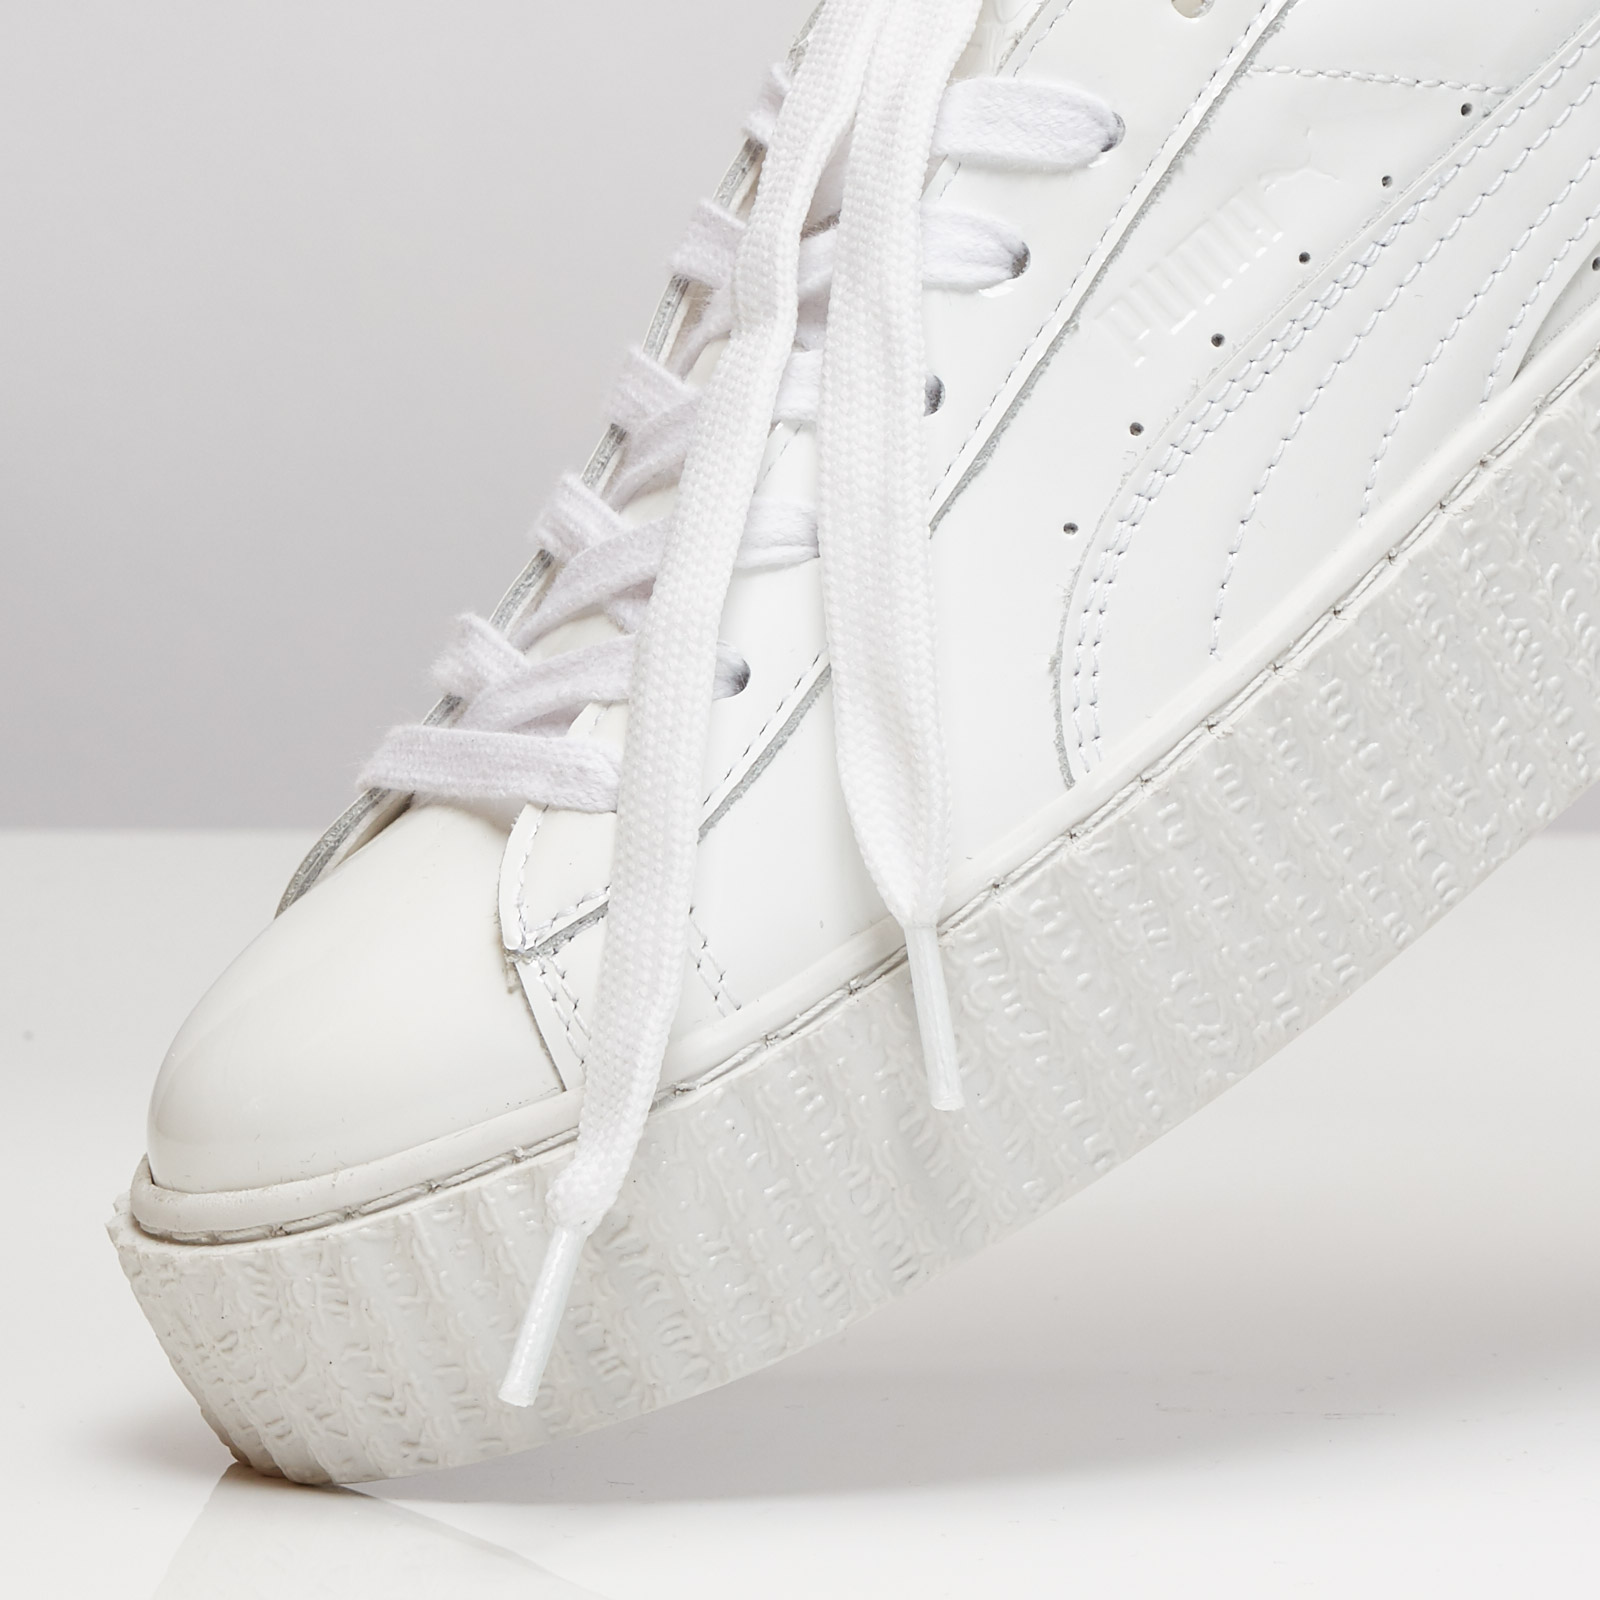 6926708931be Puma Basket Creepers Glo Rihanna - 362269-01 - Sneakersnstuff ...